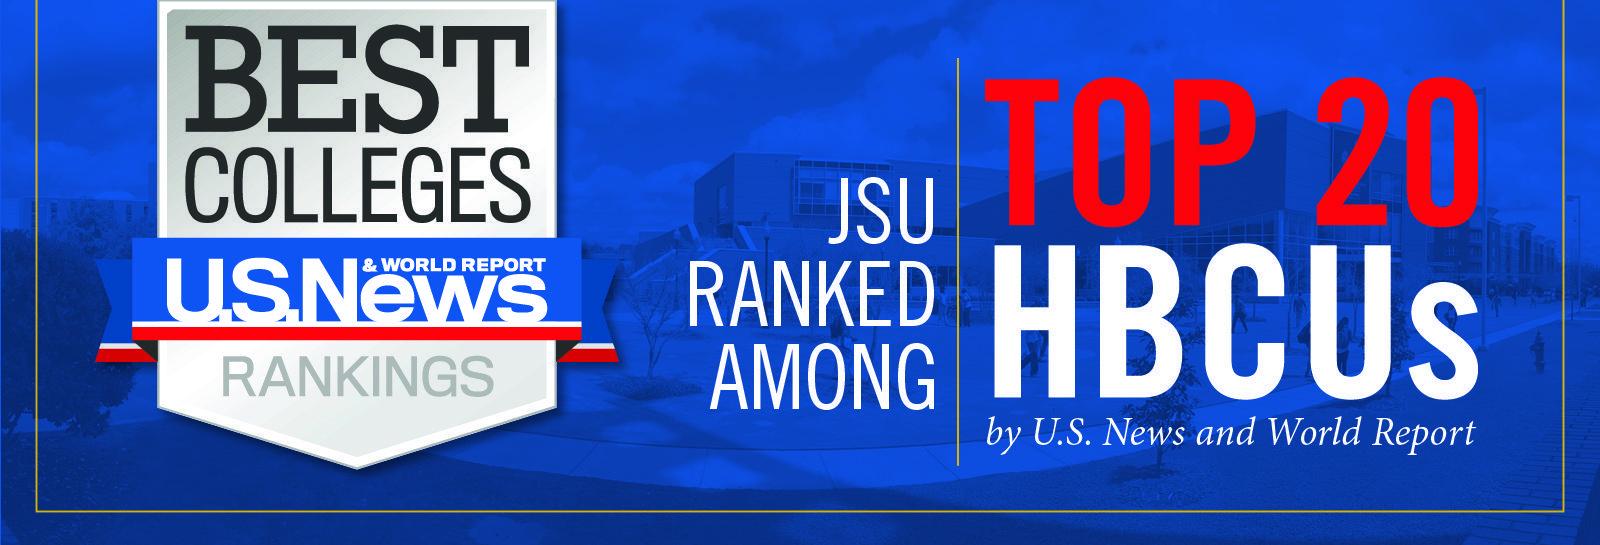 jsu-ranked-among-top-20-hbcus-slider